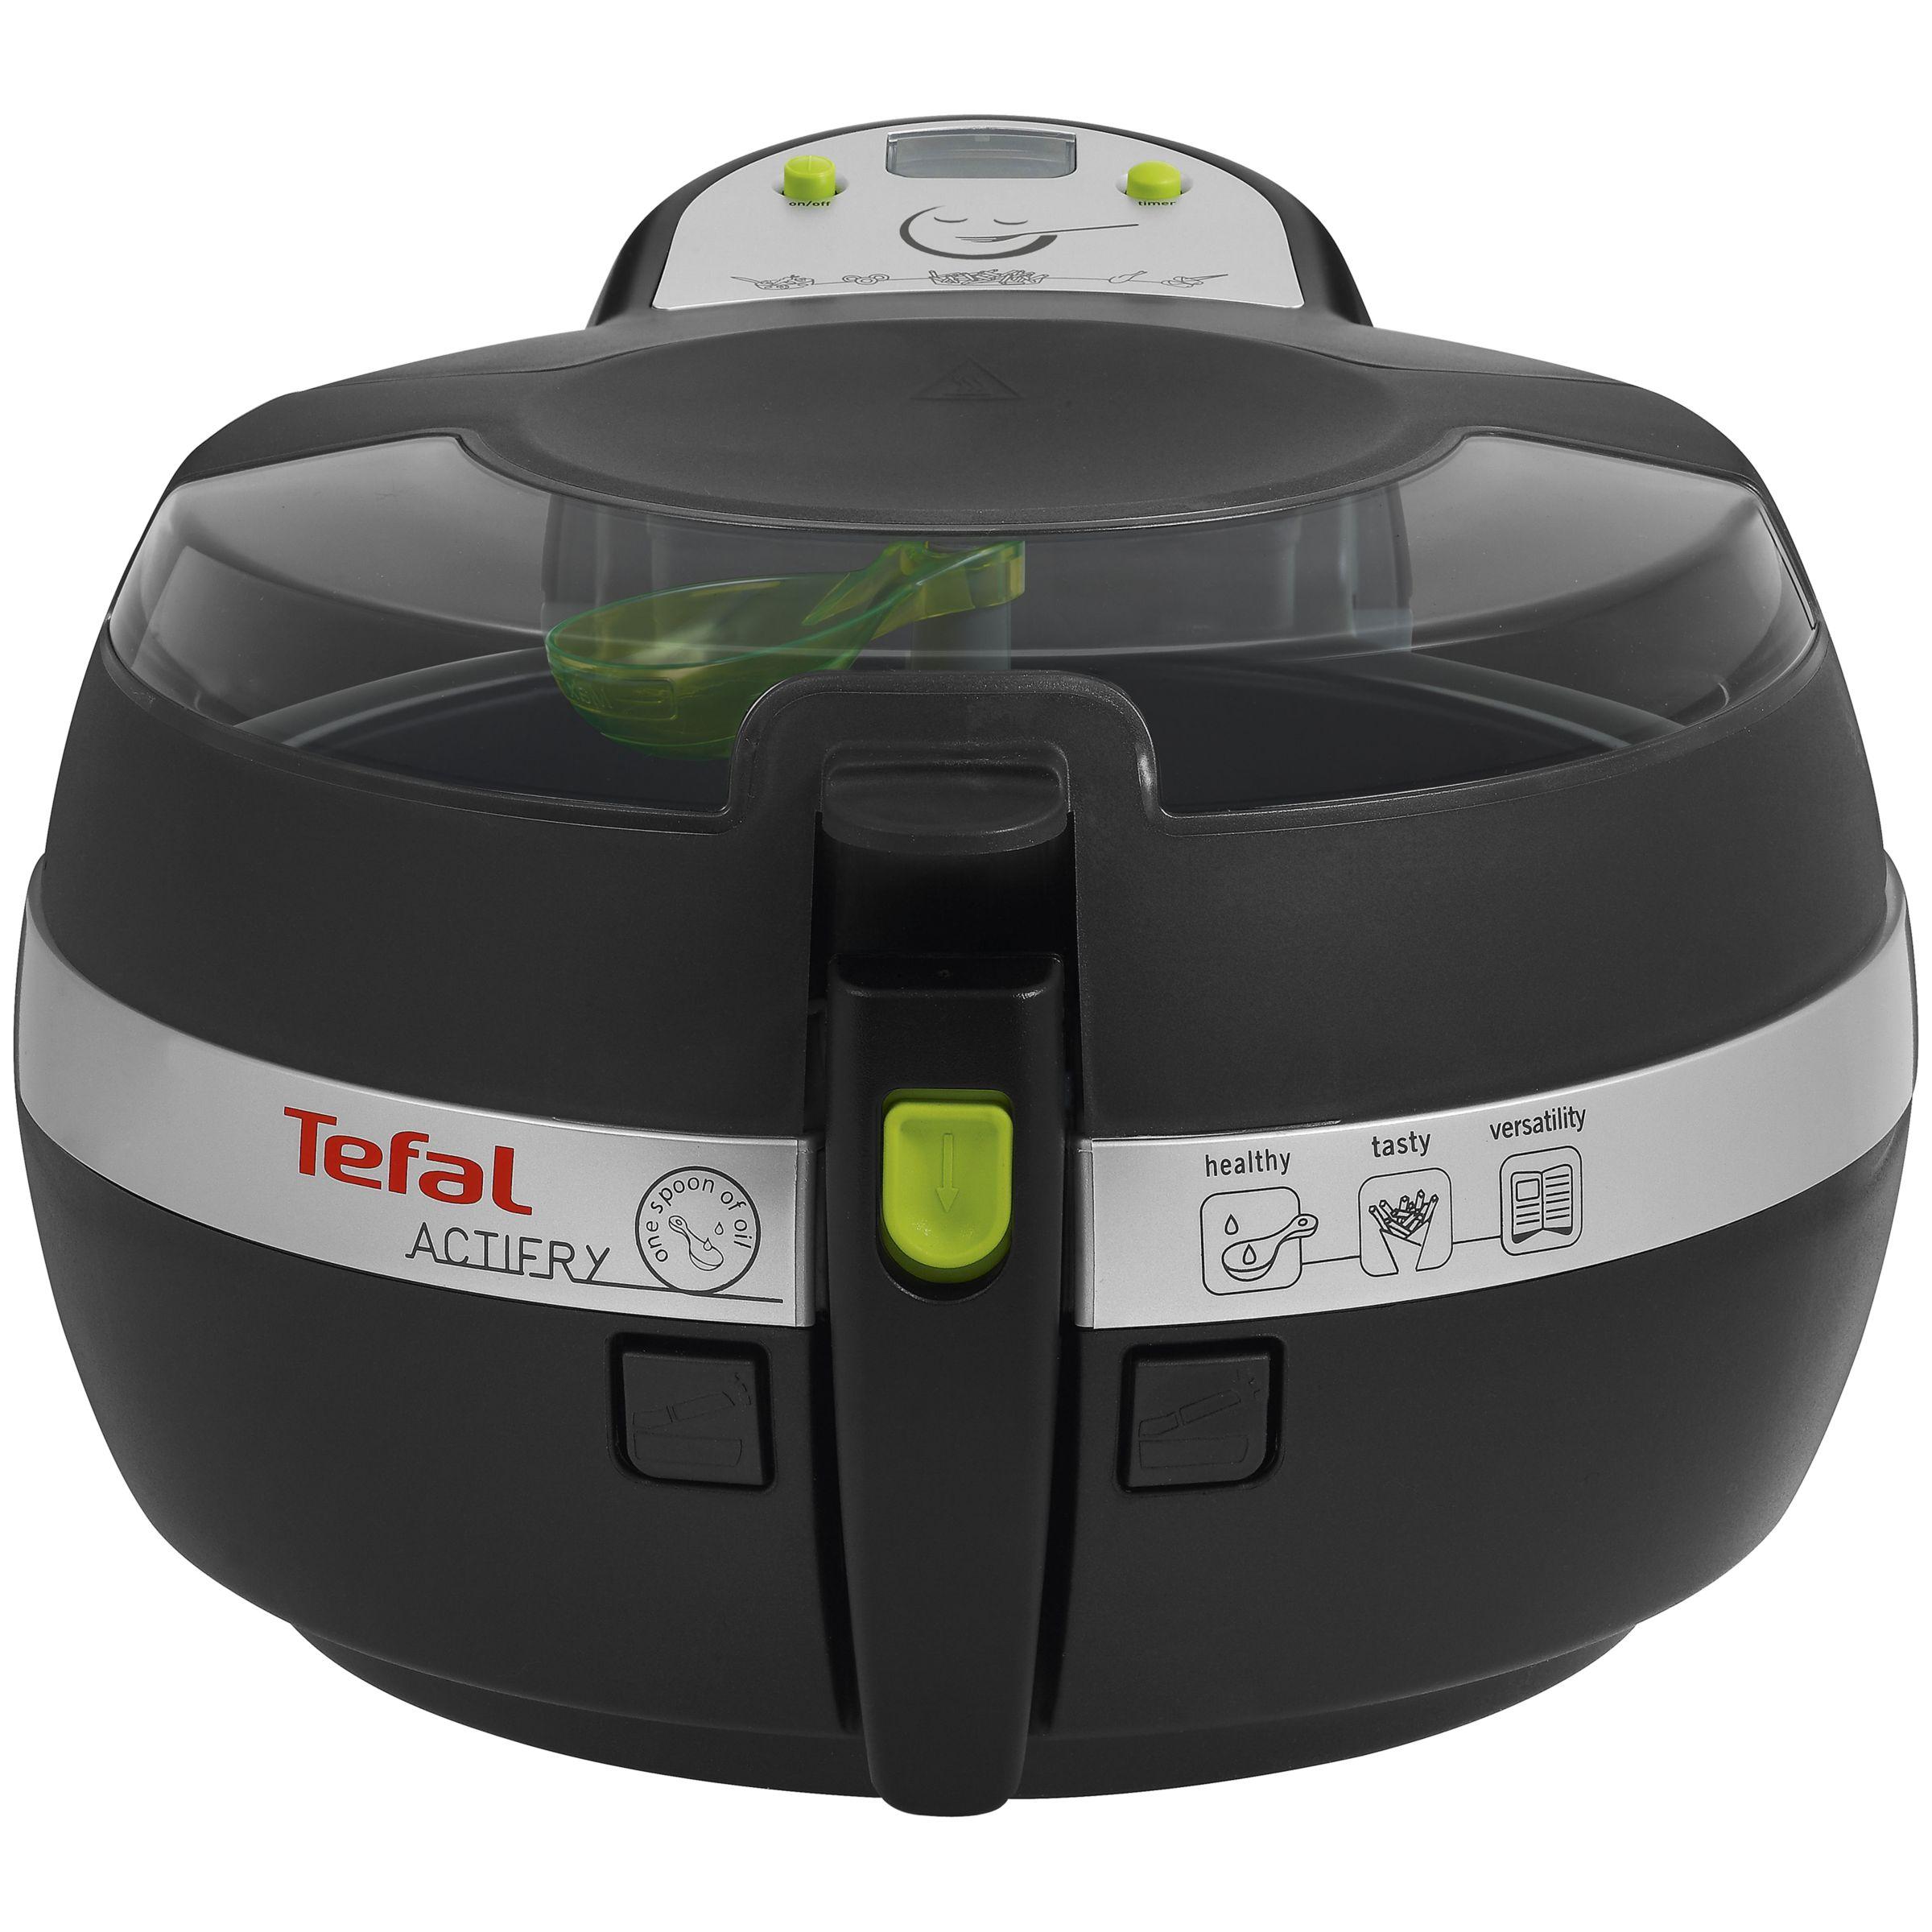 Tefal ActiFry Low Fat Fryer Black